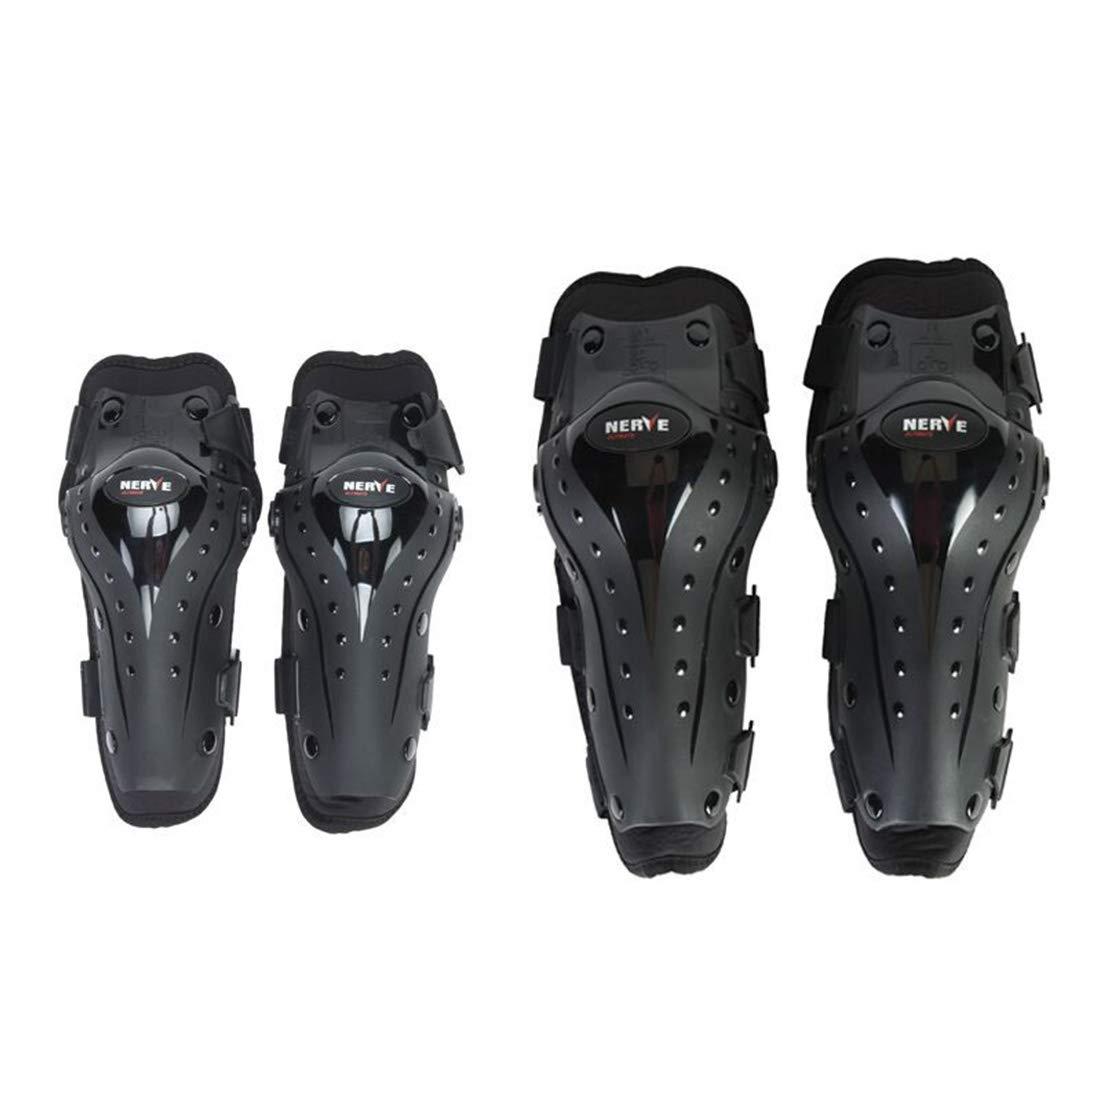 AIYAMAYA Motorcycle Elbow and Knee Pads Motocross Cycling Protector Guard Armors Set for Cycling Skating Skiing Riding-4pcs (Size : One Set)